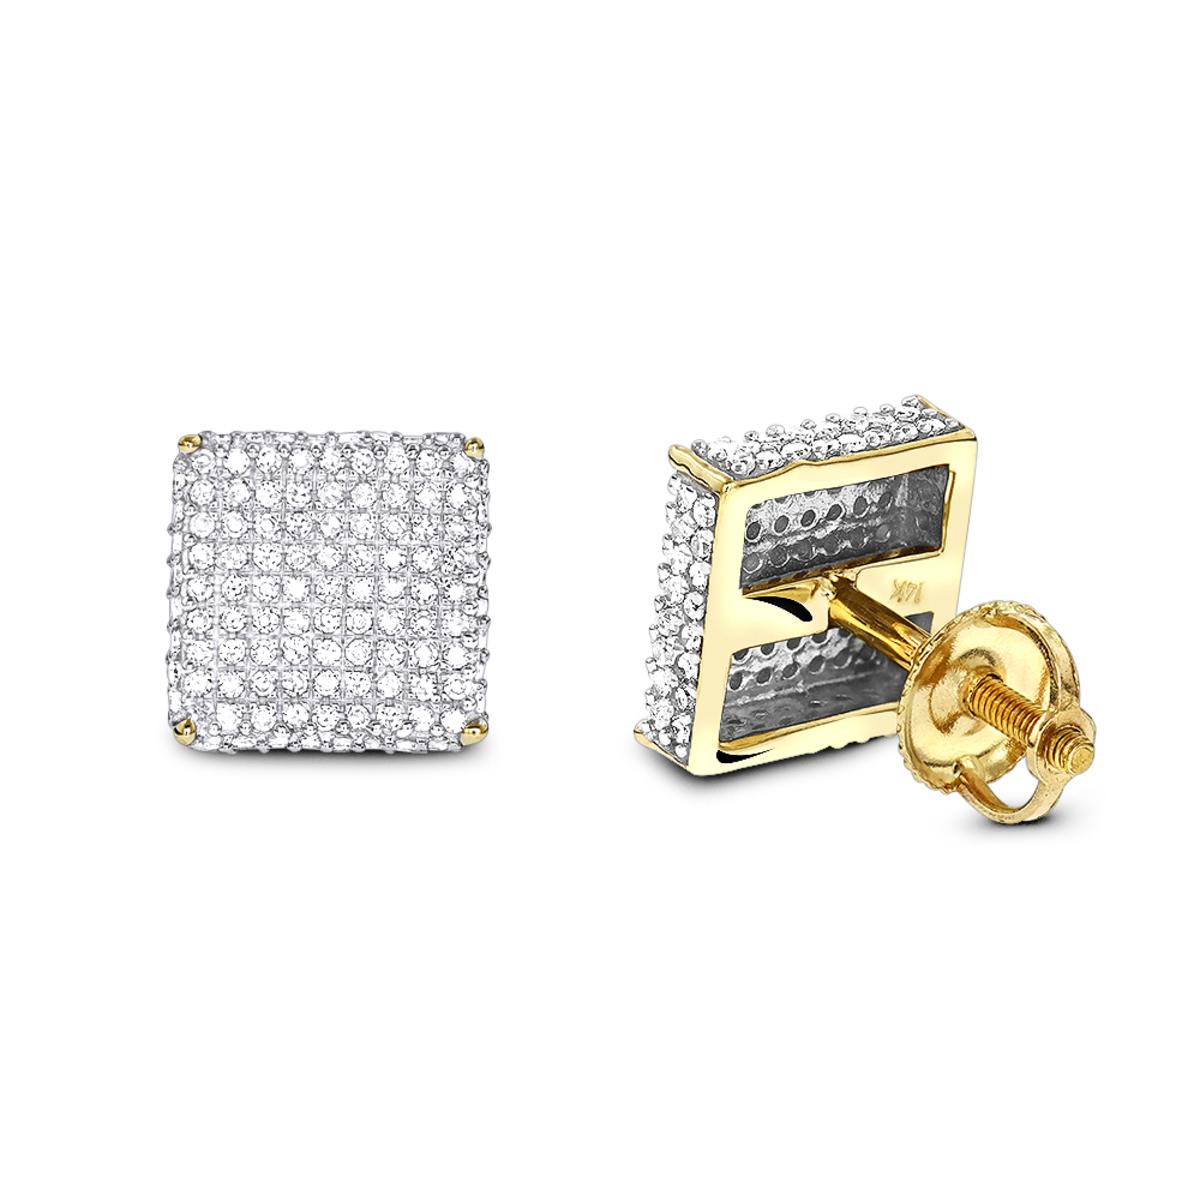 1 Carat Diamond Earrings 14K Gold Studs